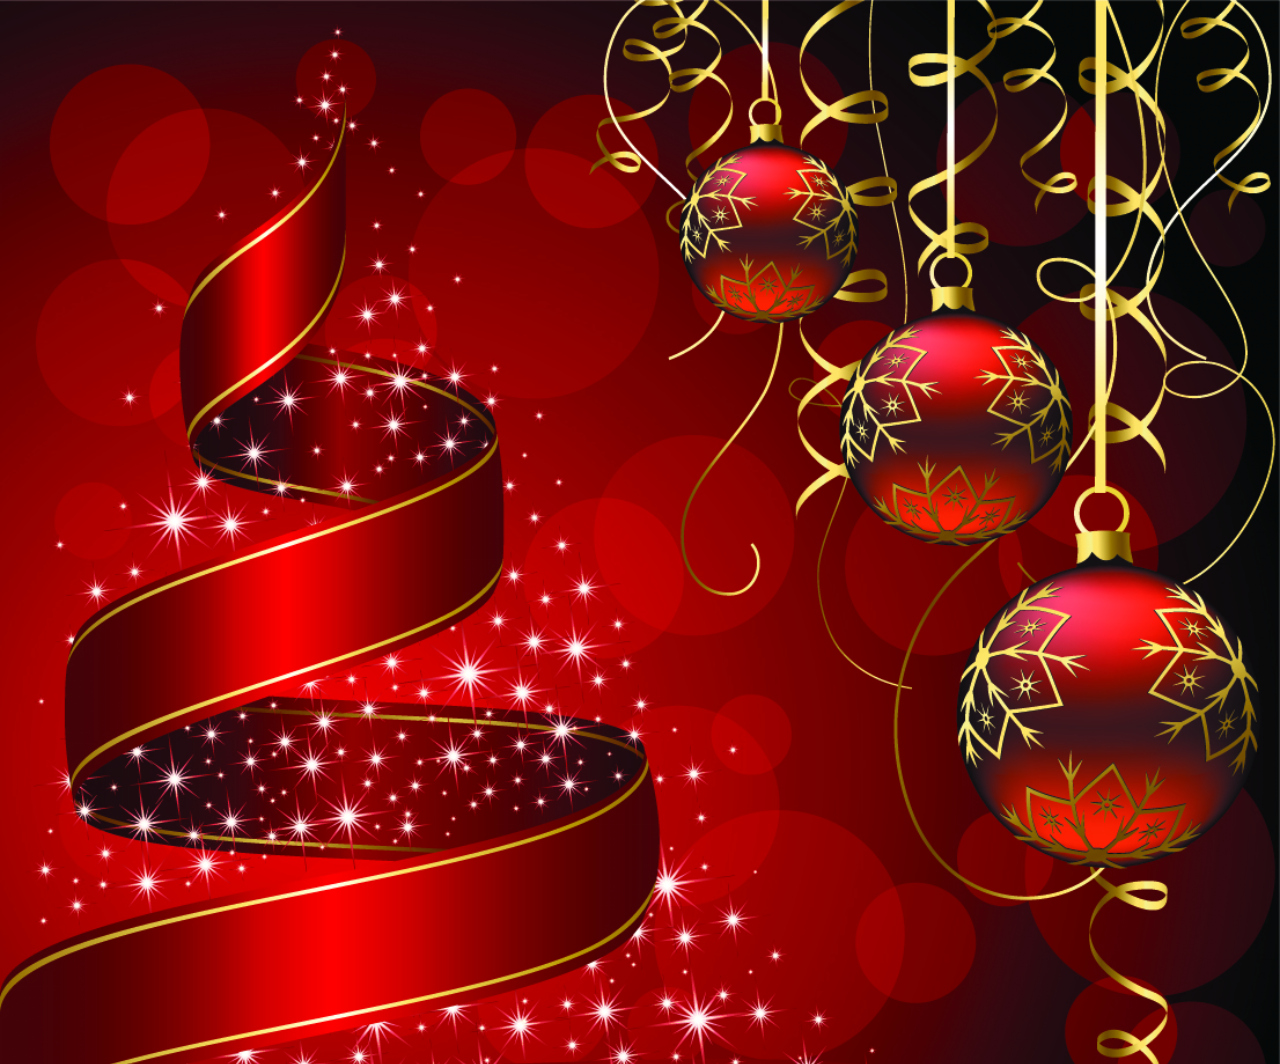 RMSSA-SUJEENDRANADAM സുജീന്ദ്രനാദം: Wish You A Happy Christmas